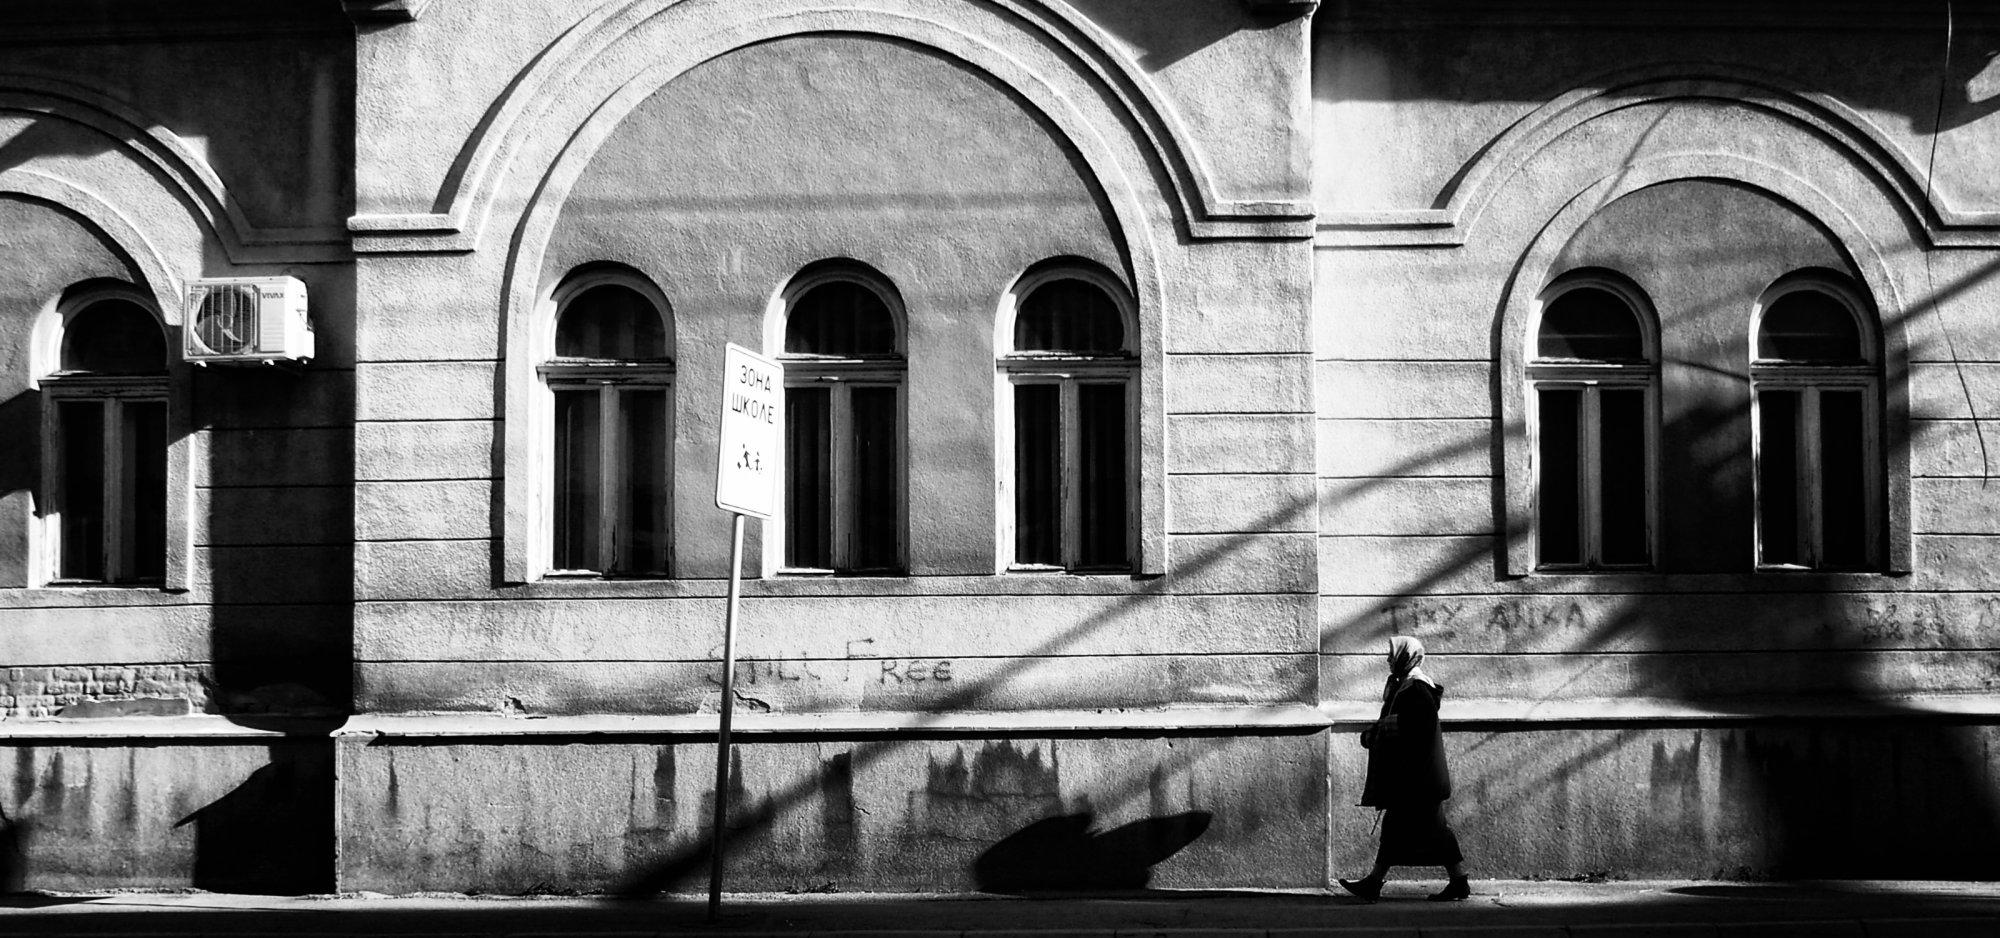 Shadows of Morning LXIII